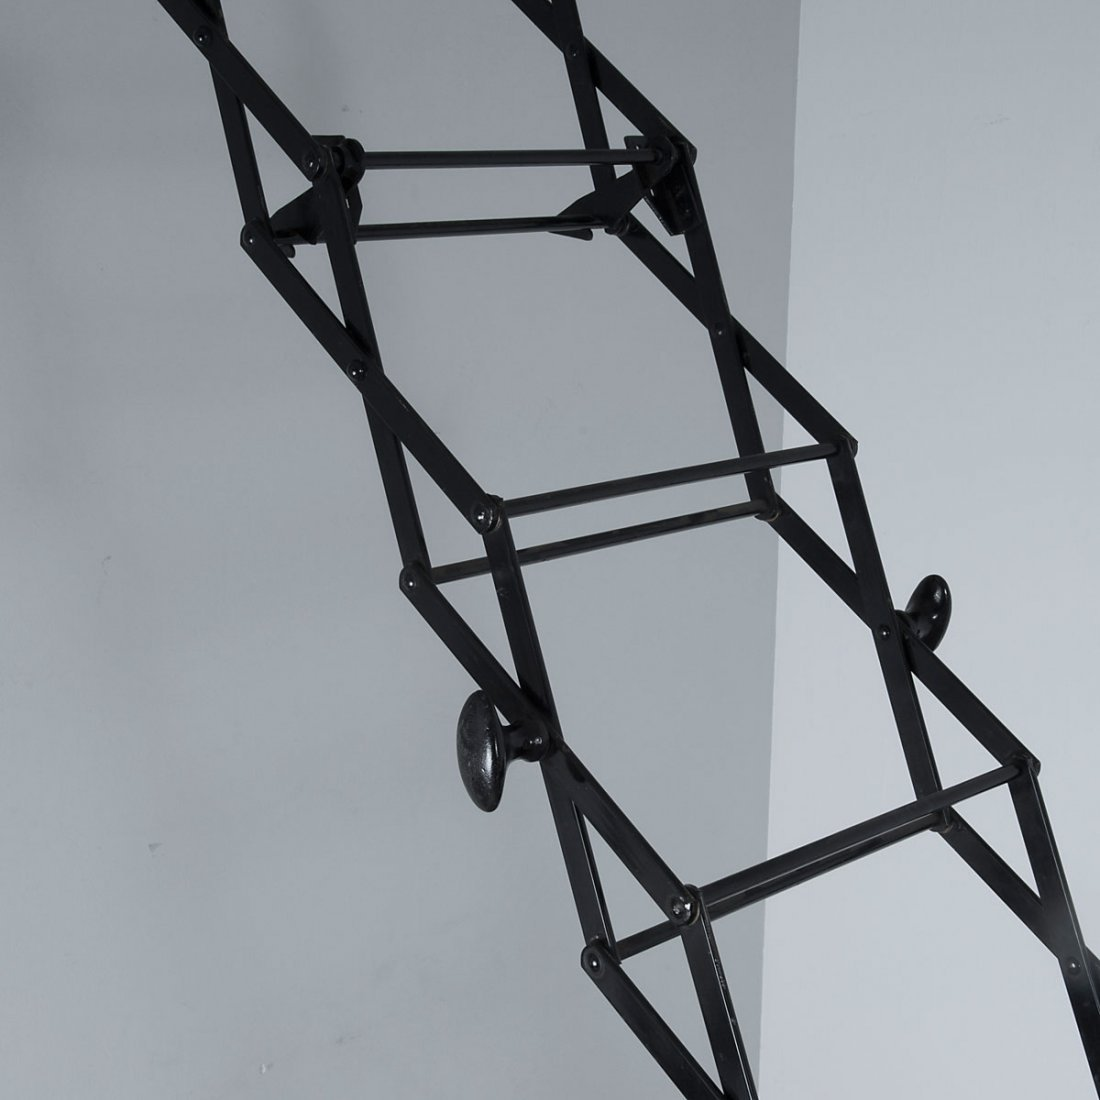 Gravity Ladders Ltd., London. Ladder, c1900. H. 28 x 38 - 2